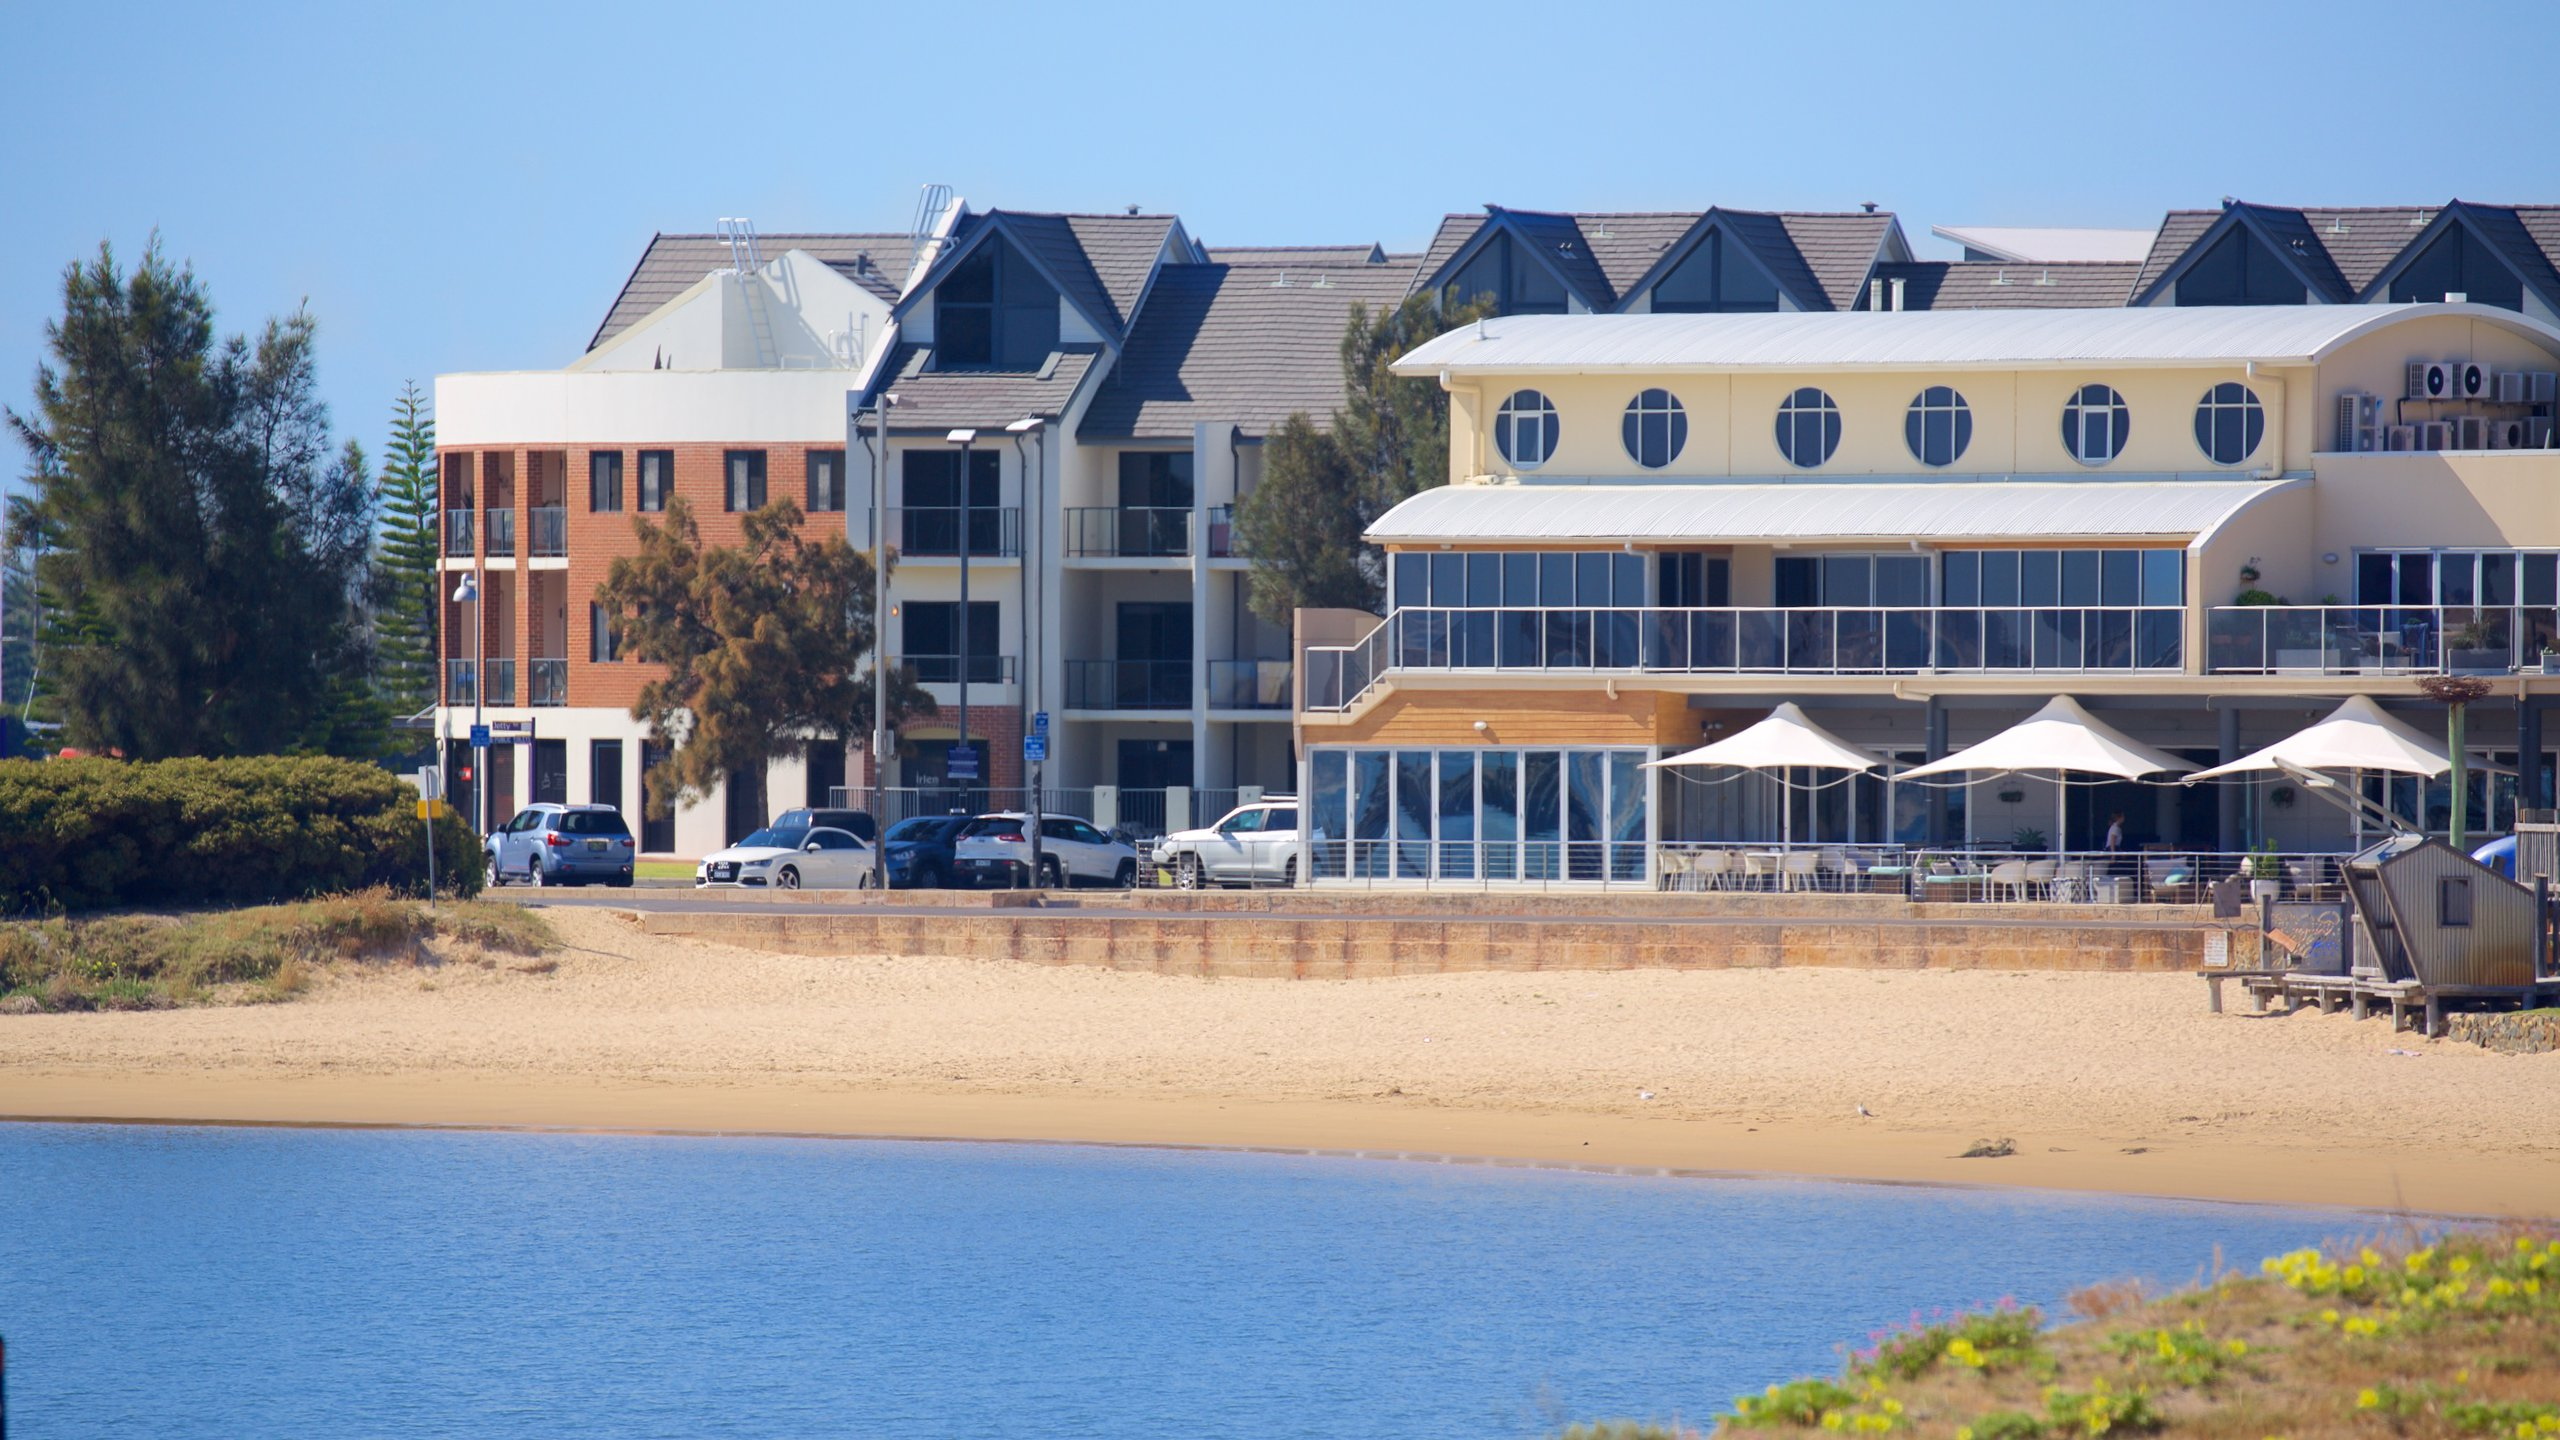 Top 10 Cheap Beach Hotels Accommodation in Bunbury | Expedia